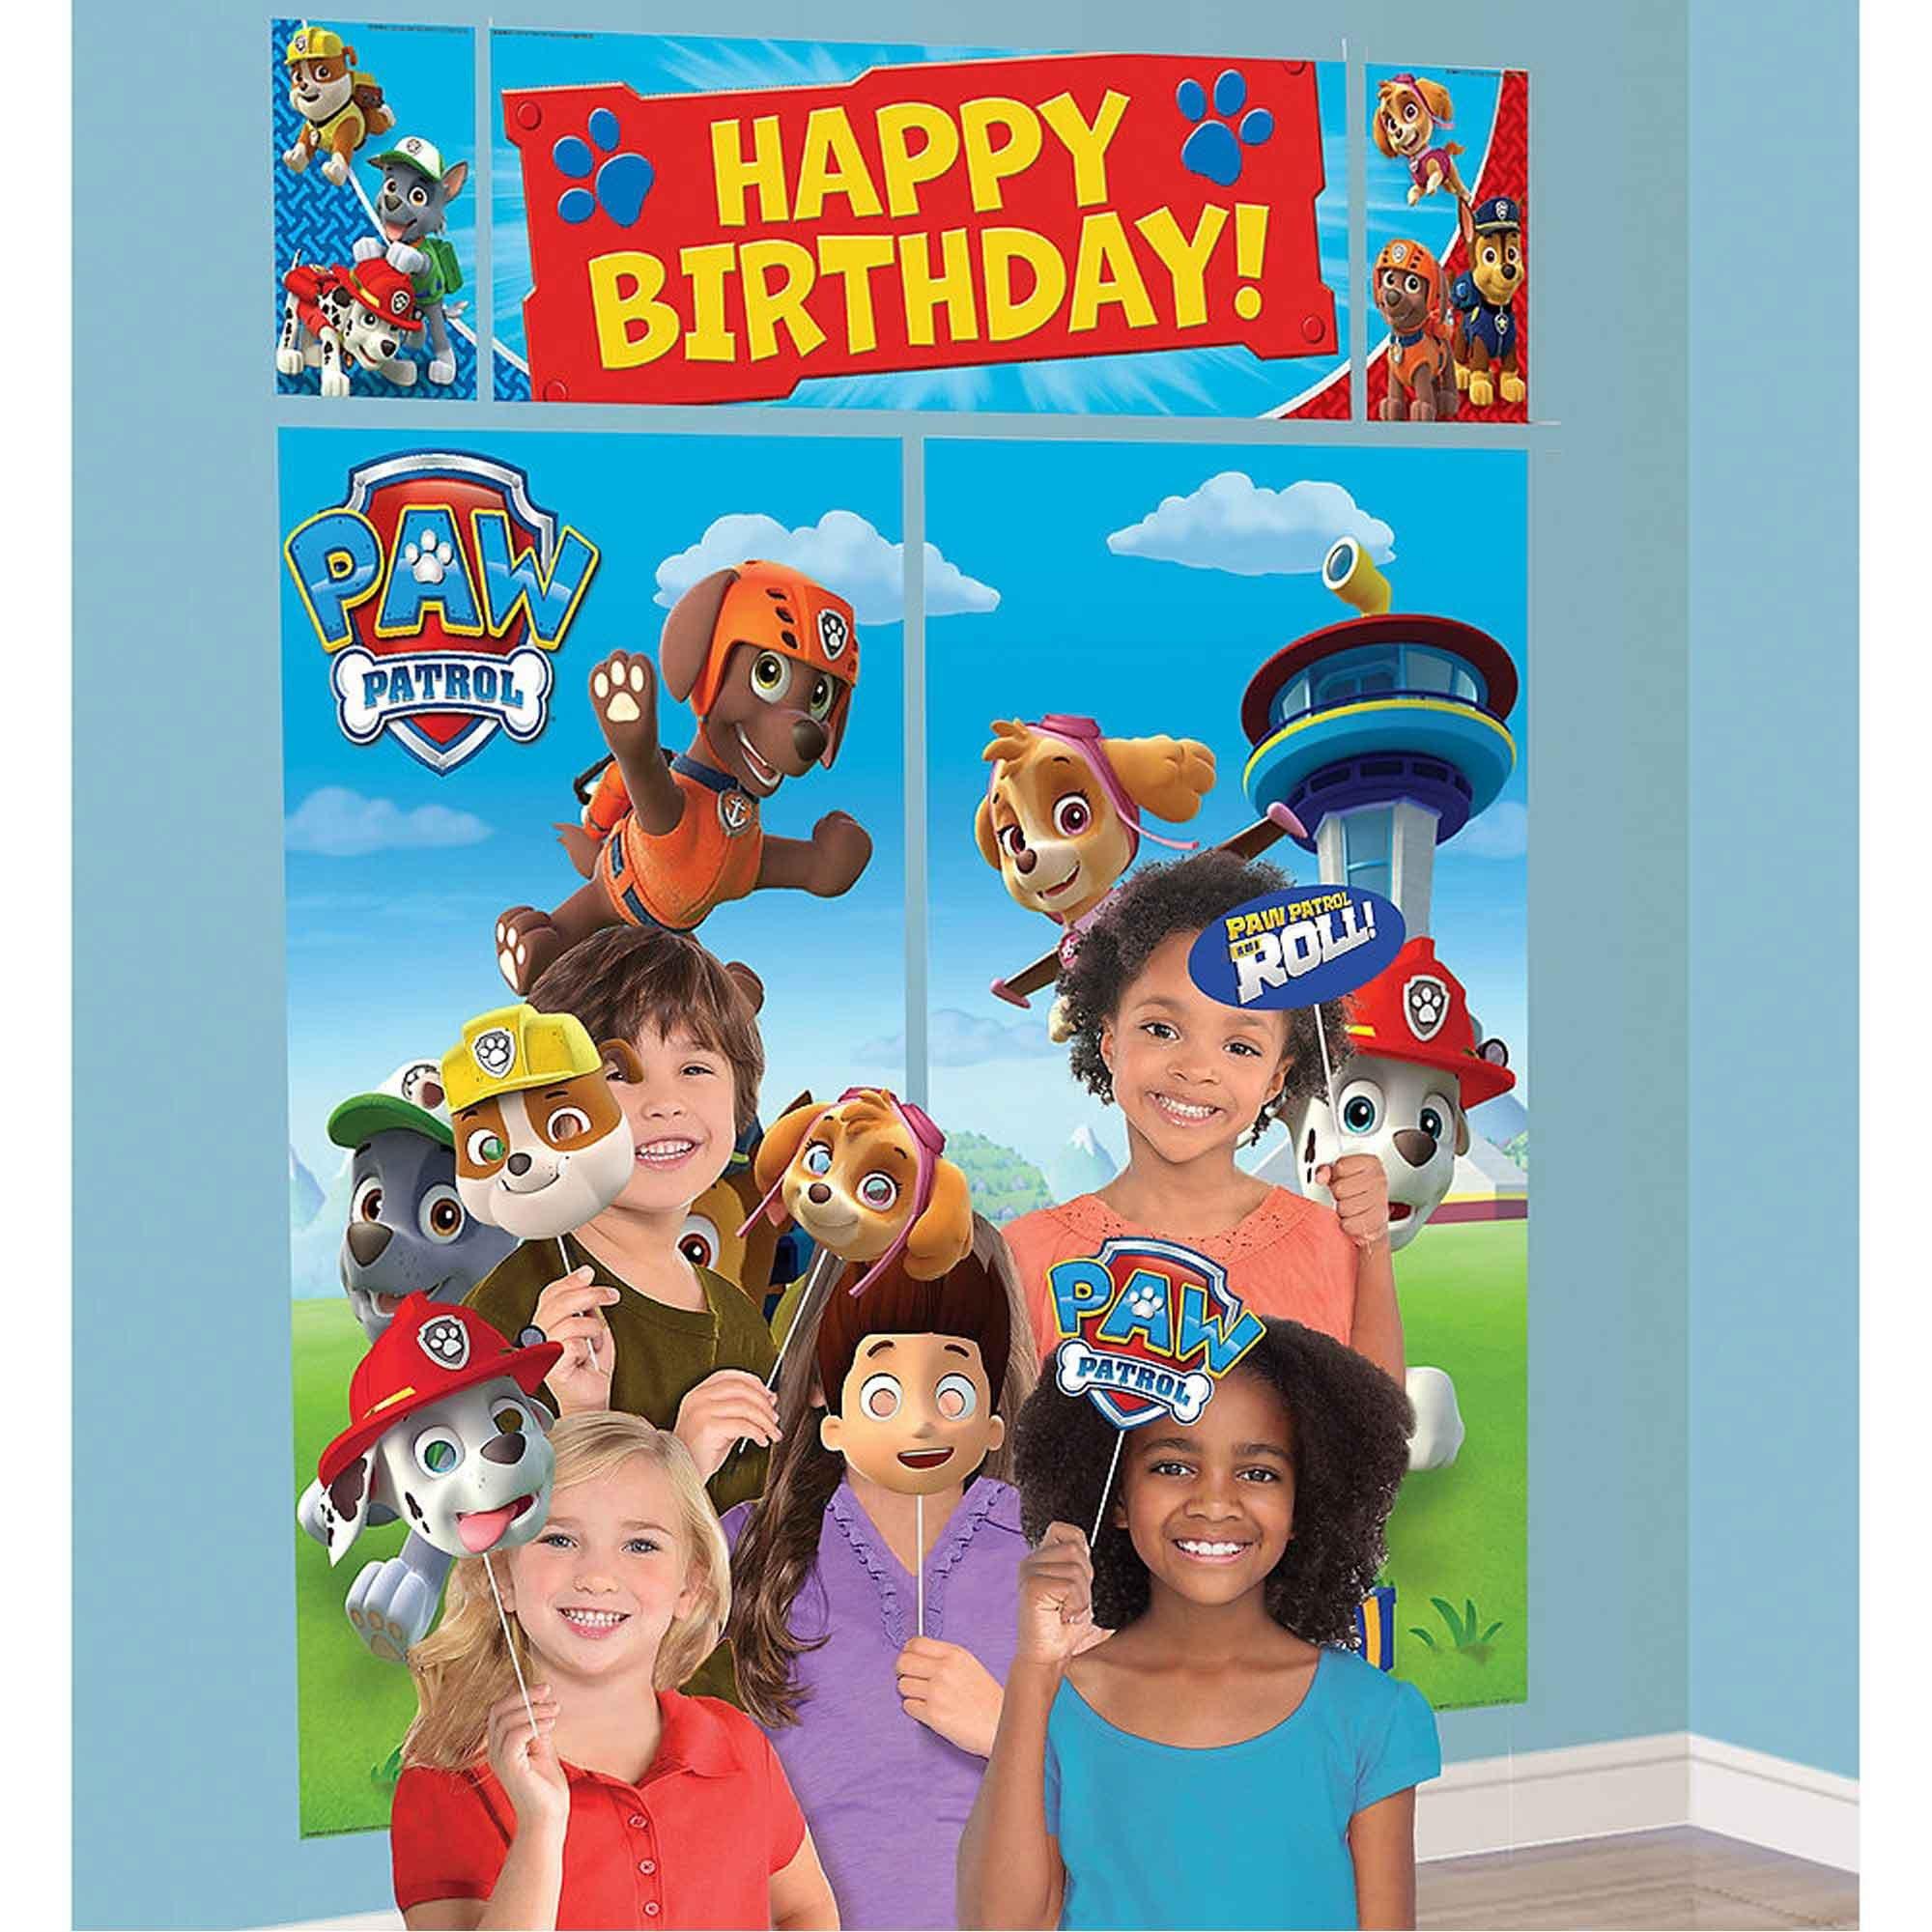 Paw Patrol Happy Birthday Scene Setter & Props                                  Plastic  - 2 x 82cm x 149cm, 1 x 111cm x 40cm, 2